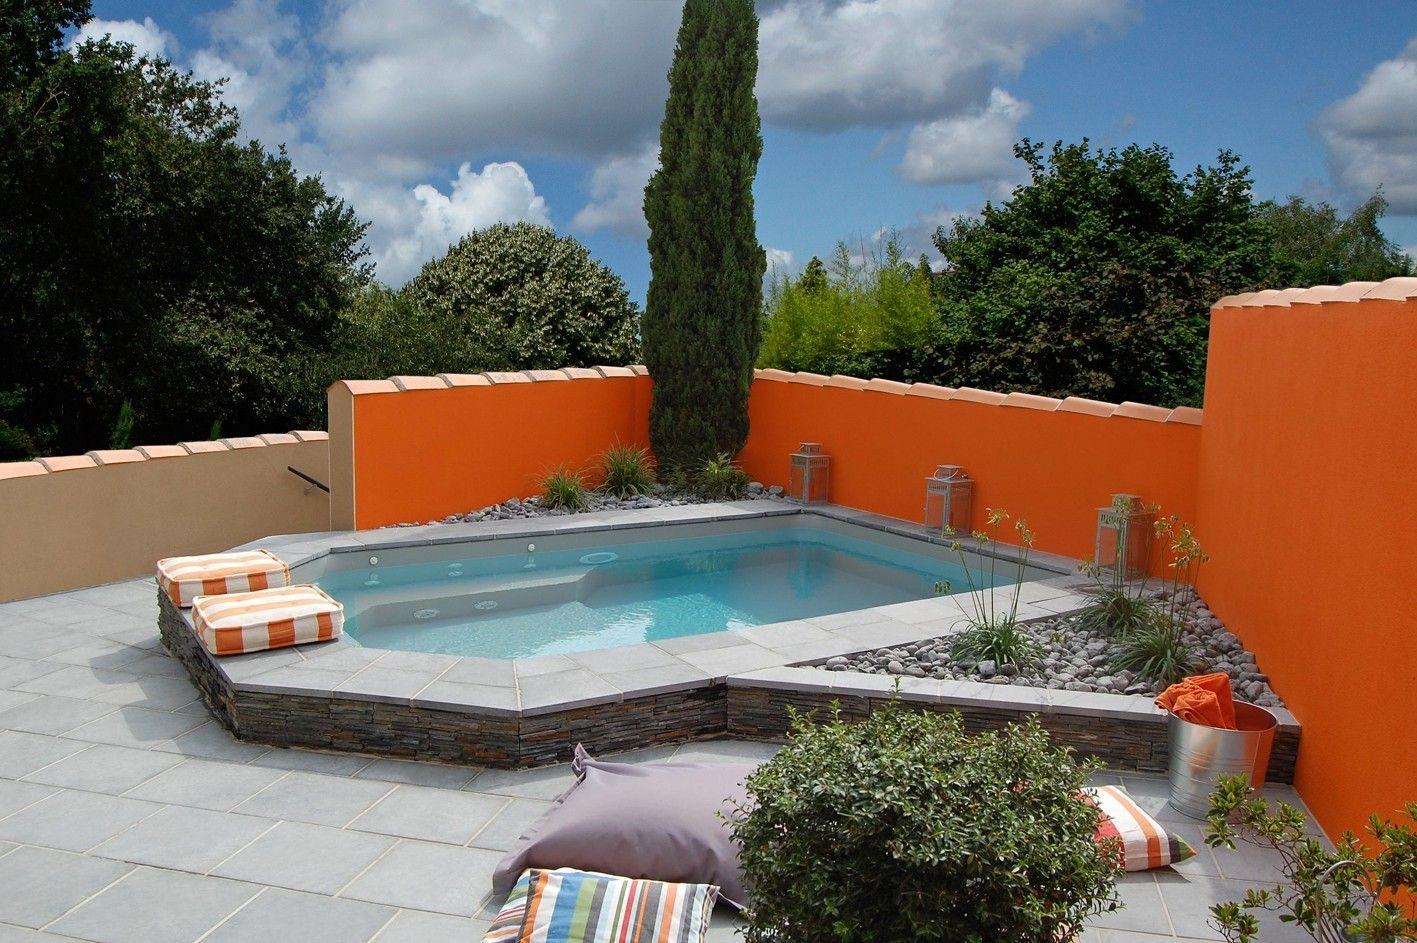 Deco Jardin Avec Piscine Luxe Photographie Decoration Piscine Inspirant Deco Jardin Avec Piscine Inspirant